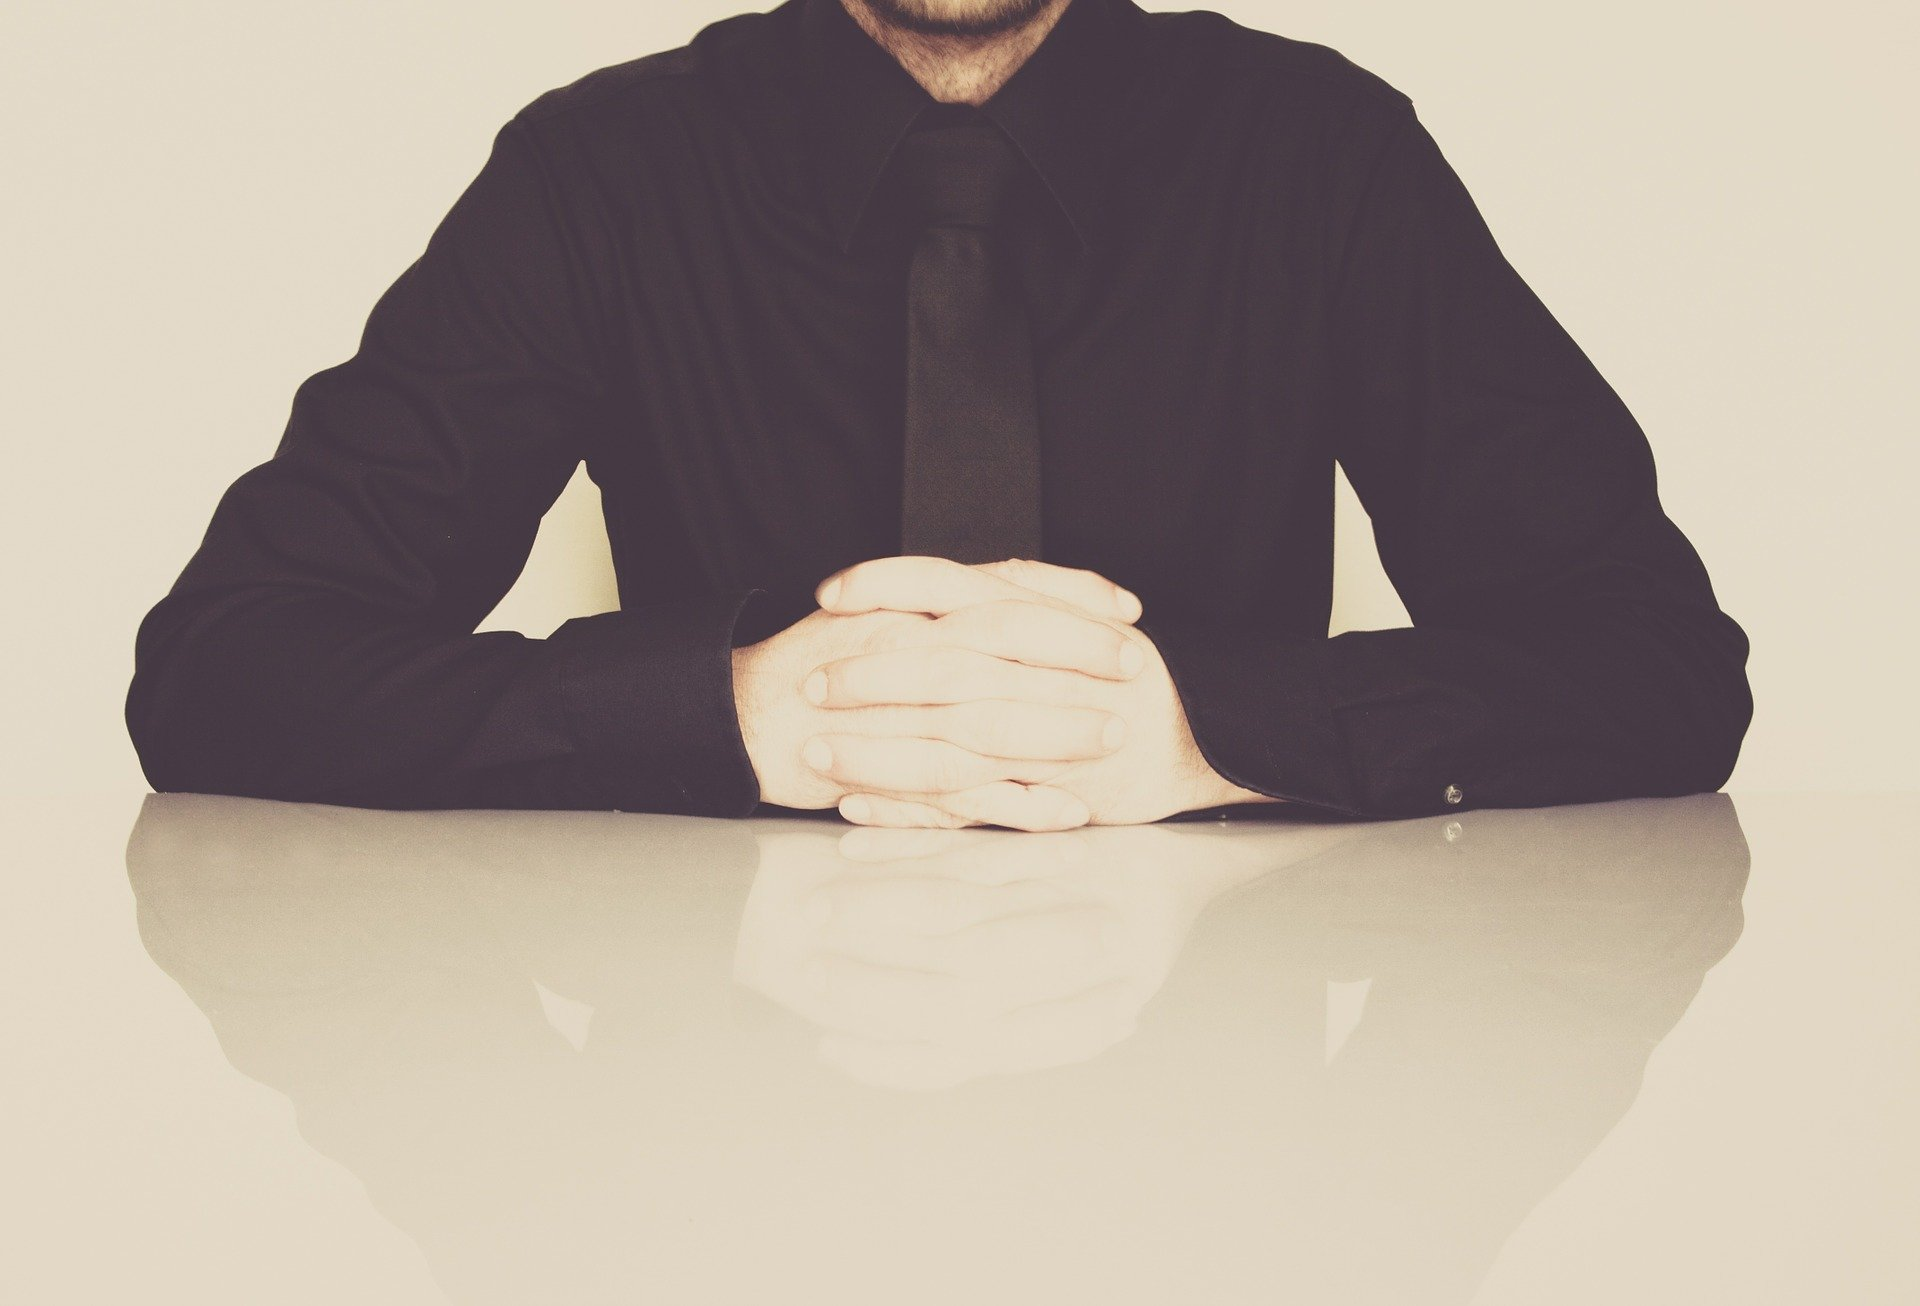 businessman-598033_1920.jpg